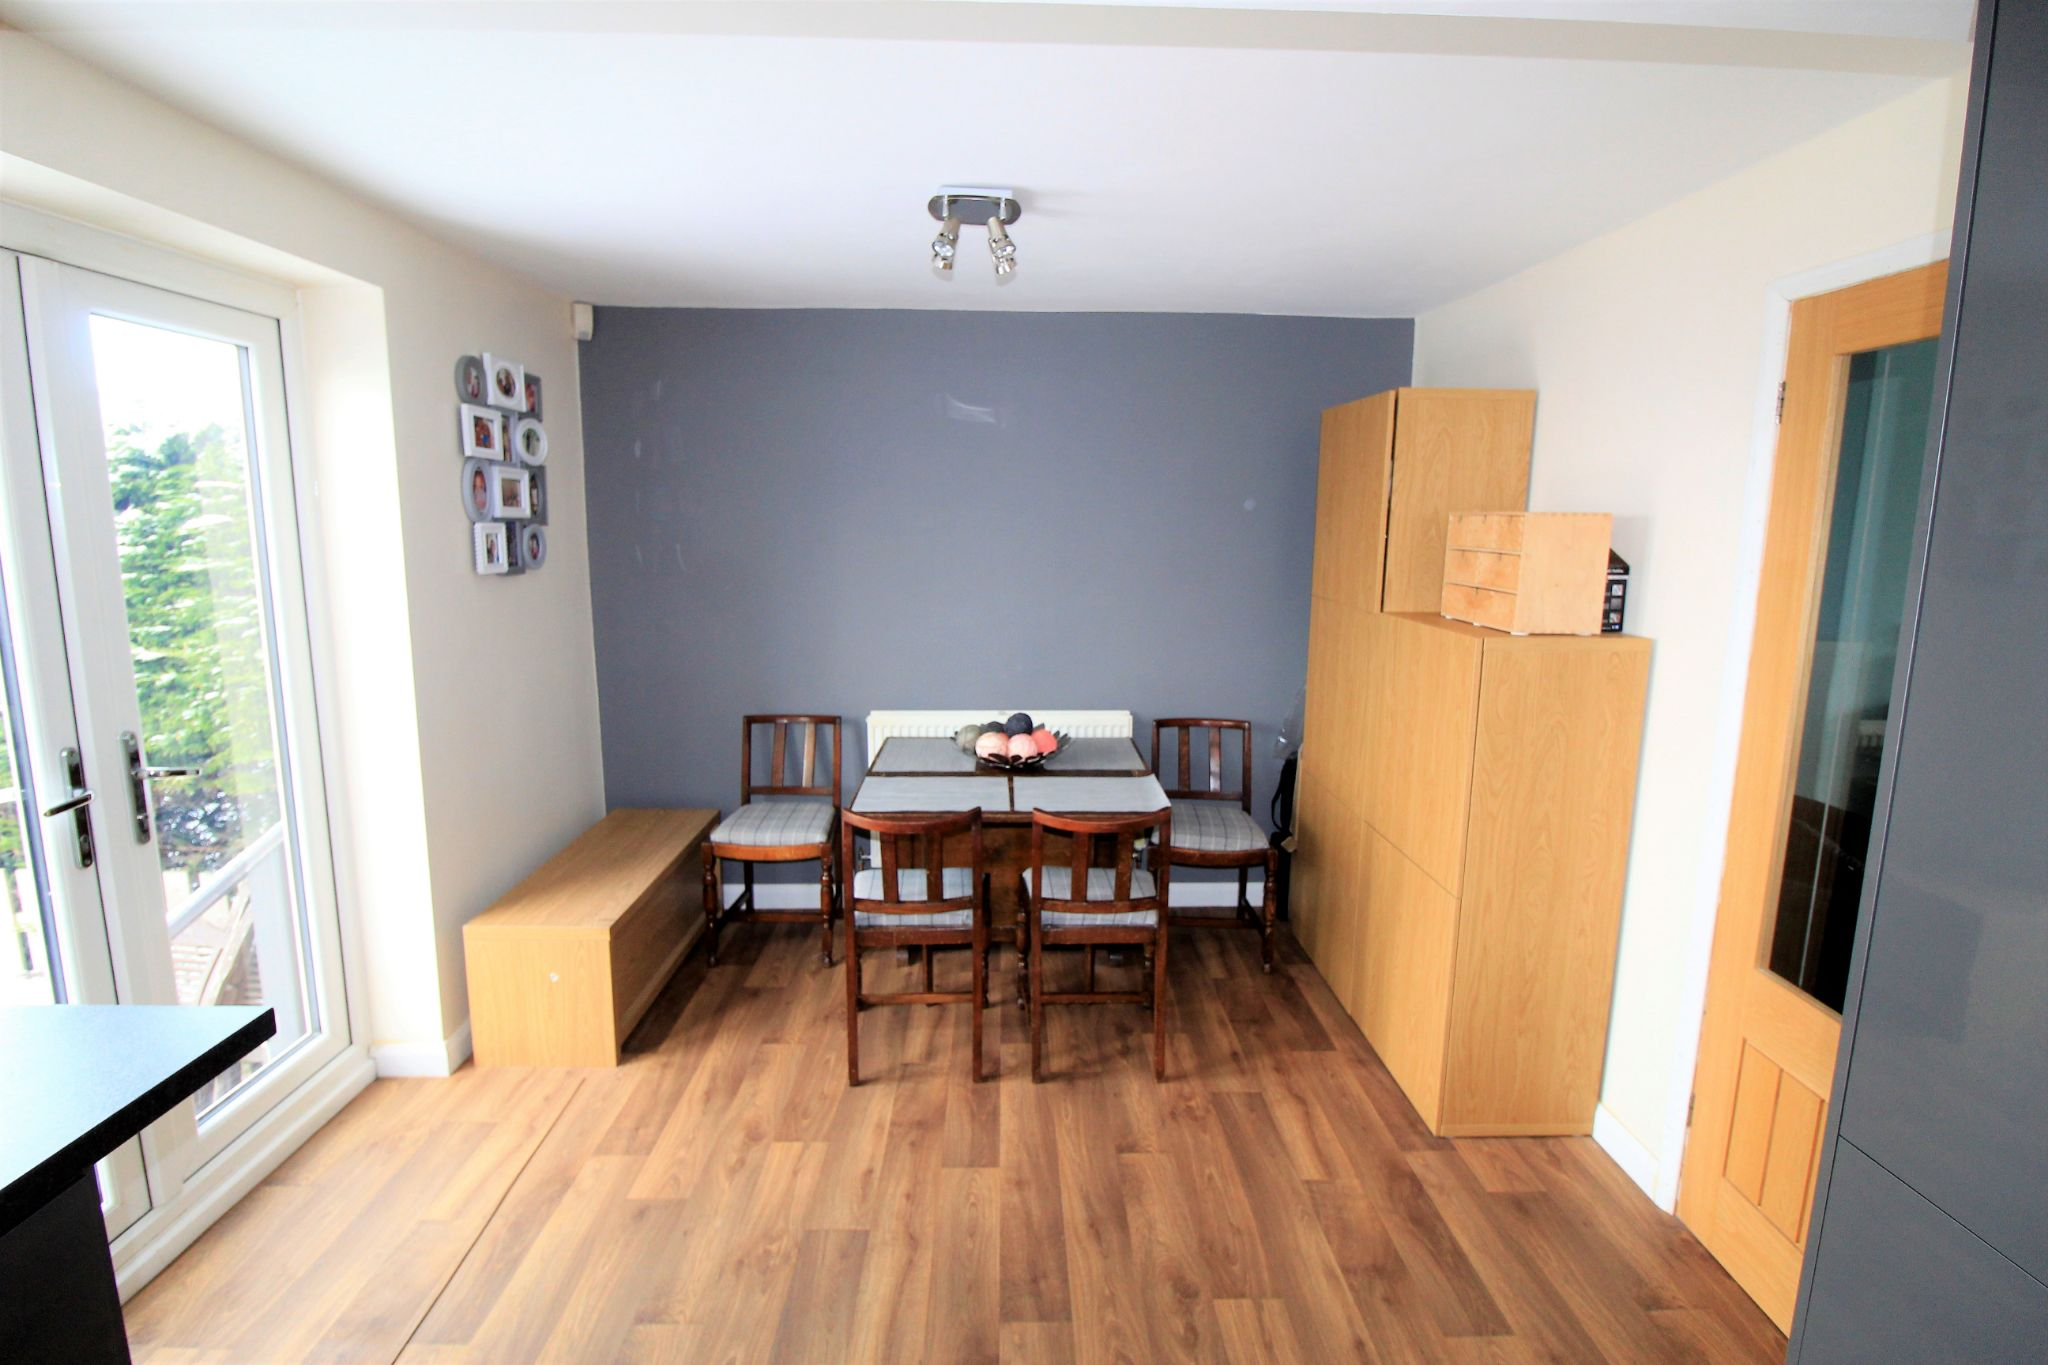 3 bedroom semi-detached house SSTC in Shipley - Dining area